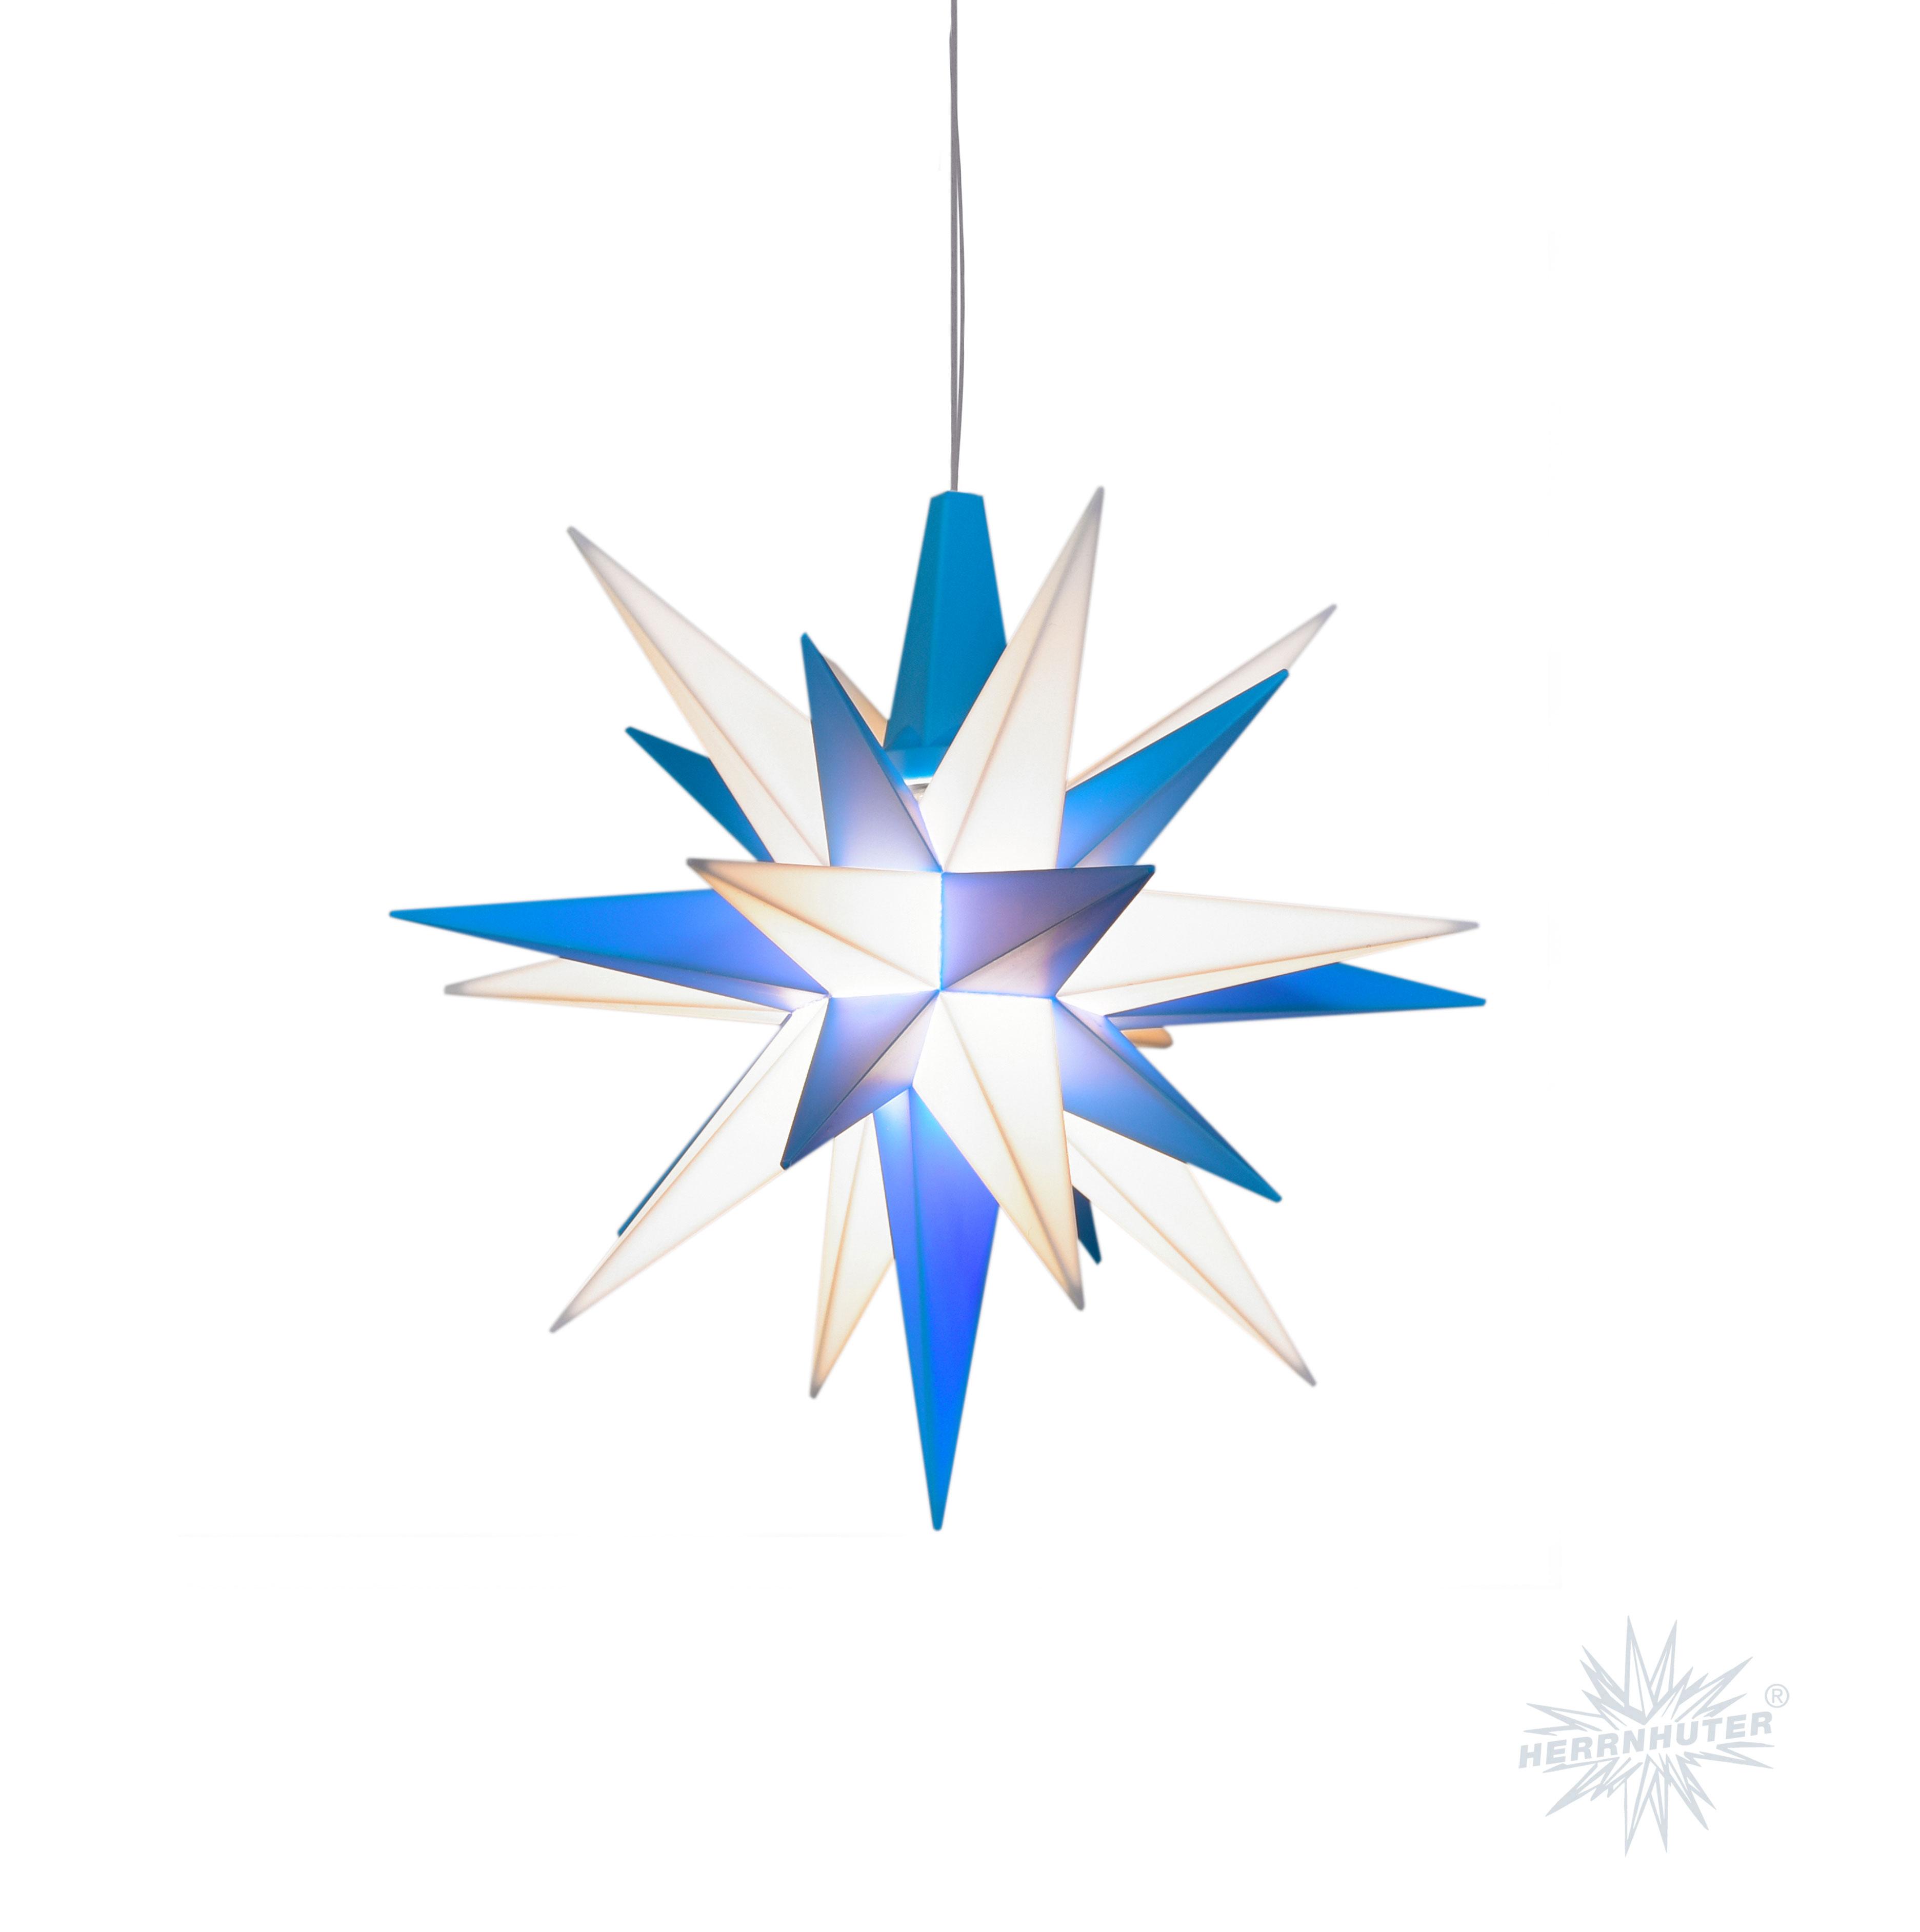 herrnhuter sterne neu 2017 herrnhuter stern einzelstern kunststoff a1e 13 cm blau wei led. Black Bedroom Furniture Sets. Home Design Ideas